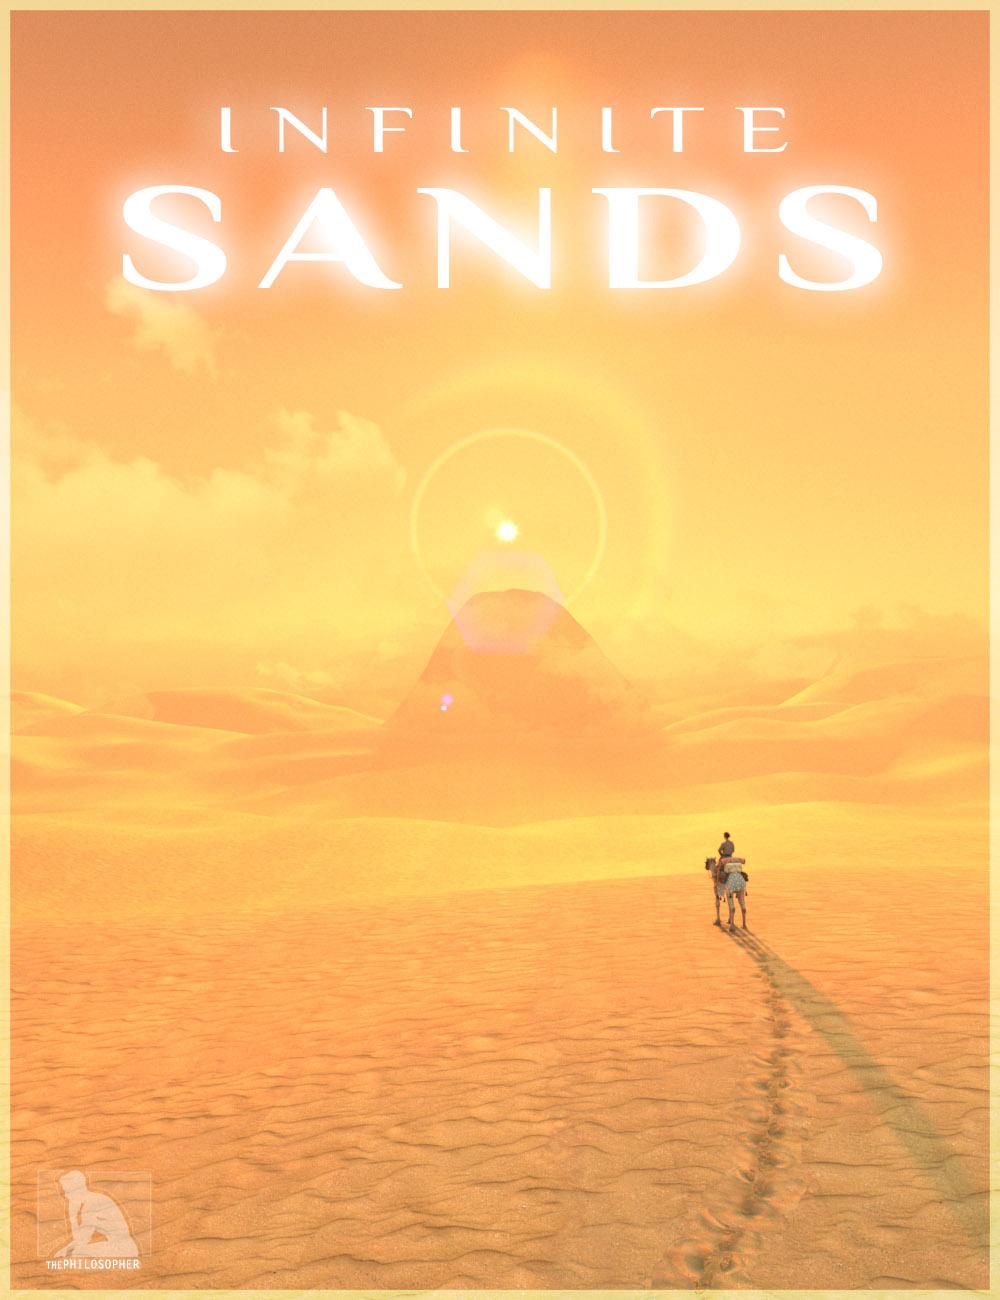 Infinite Sands - Desert Environment by: ThePhilosopher, 3D Models by Daz 3D